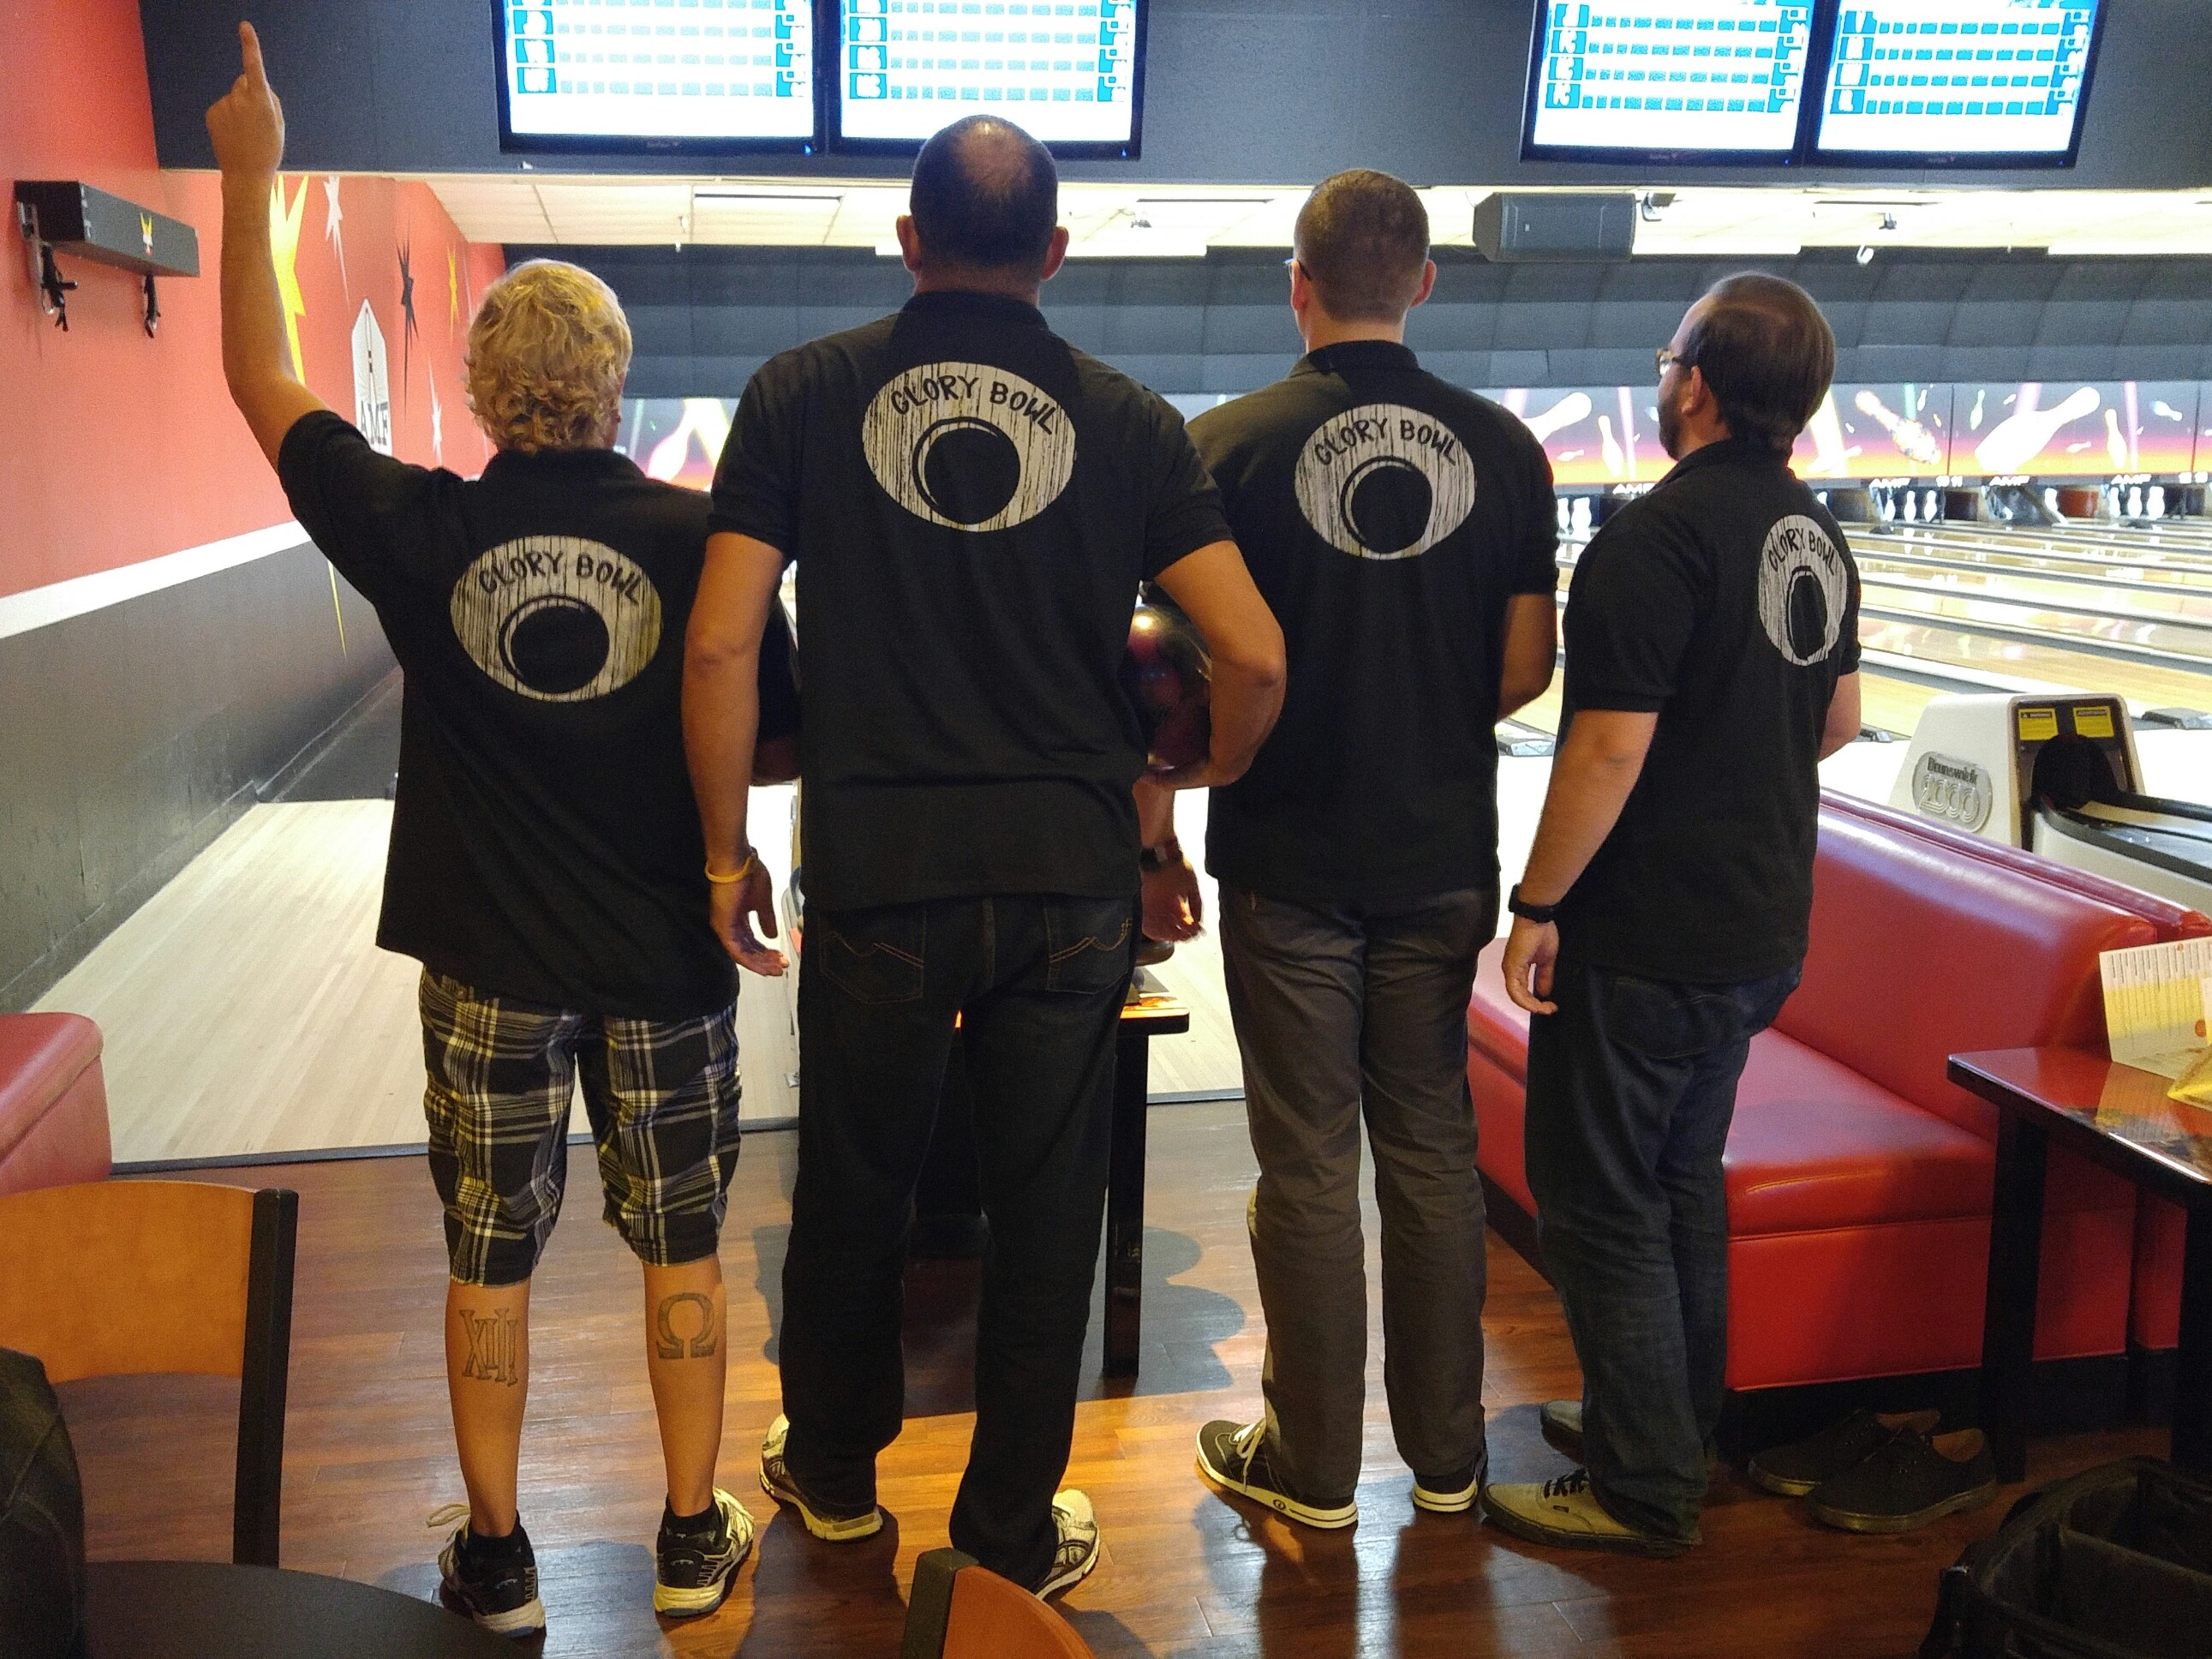 61b0ef902 Custom T-Shirts for Custom Ink Makes Bowling Shirts! - Shirt Design ...